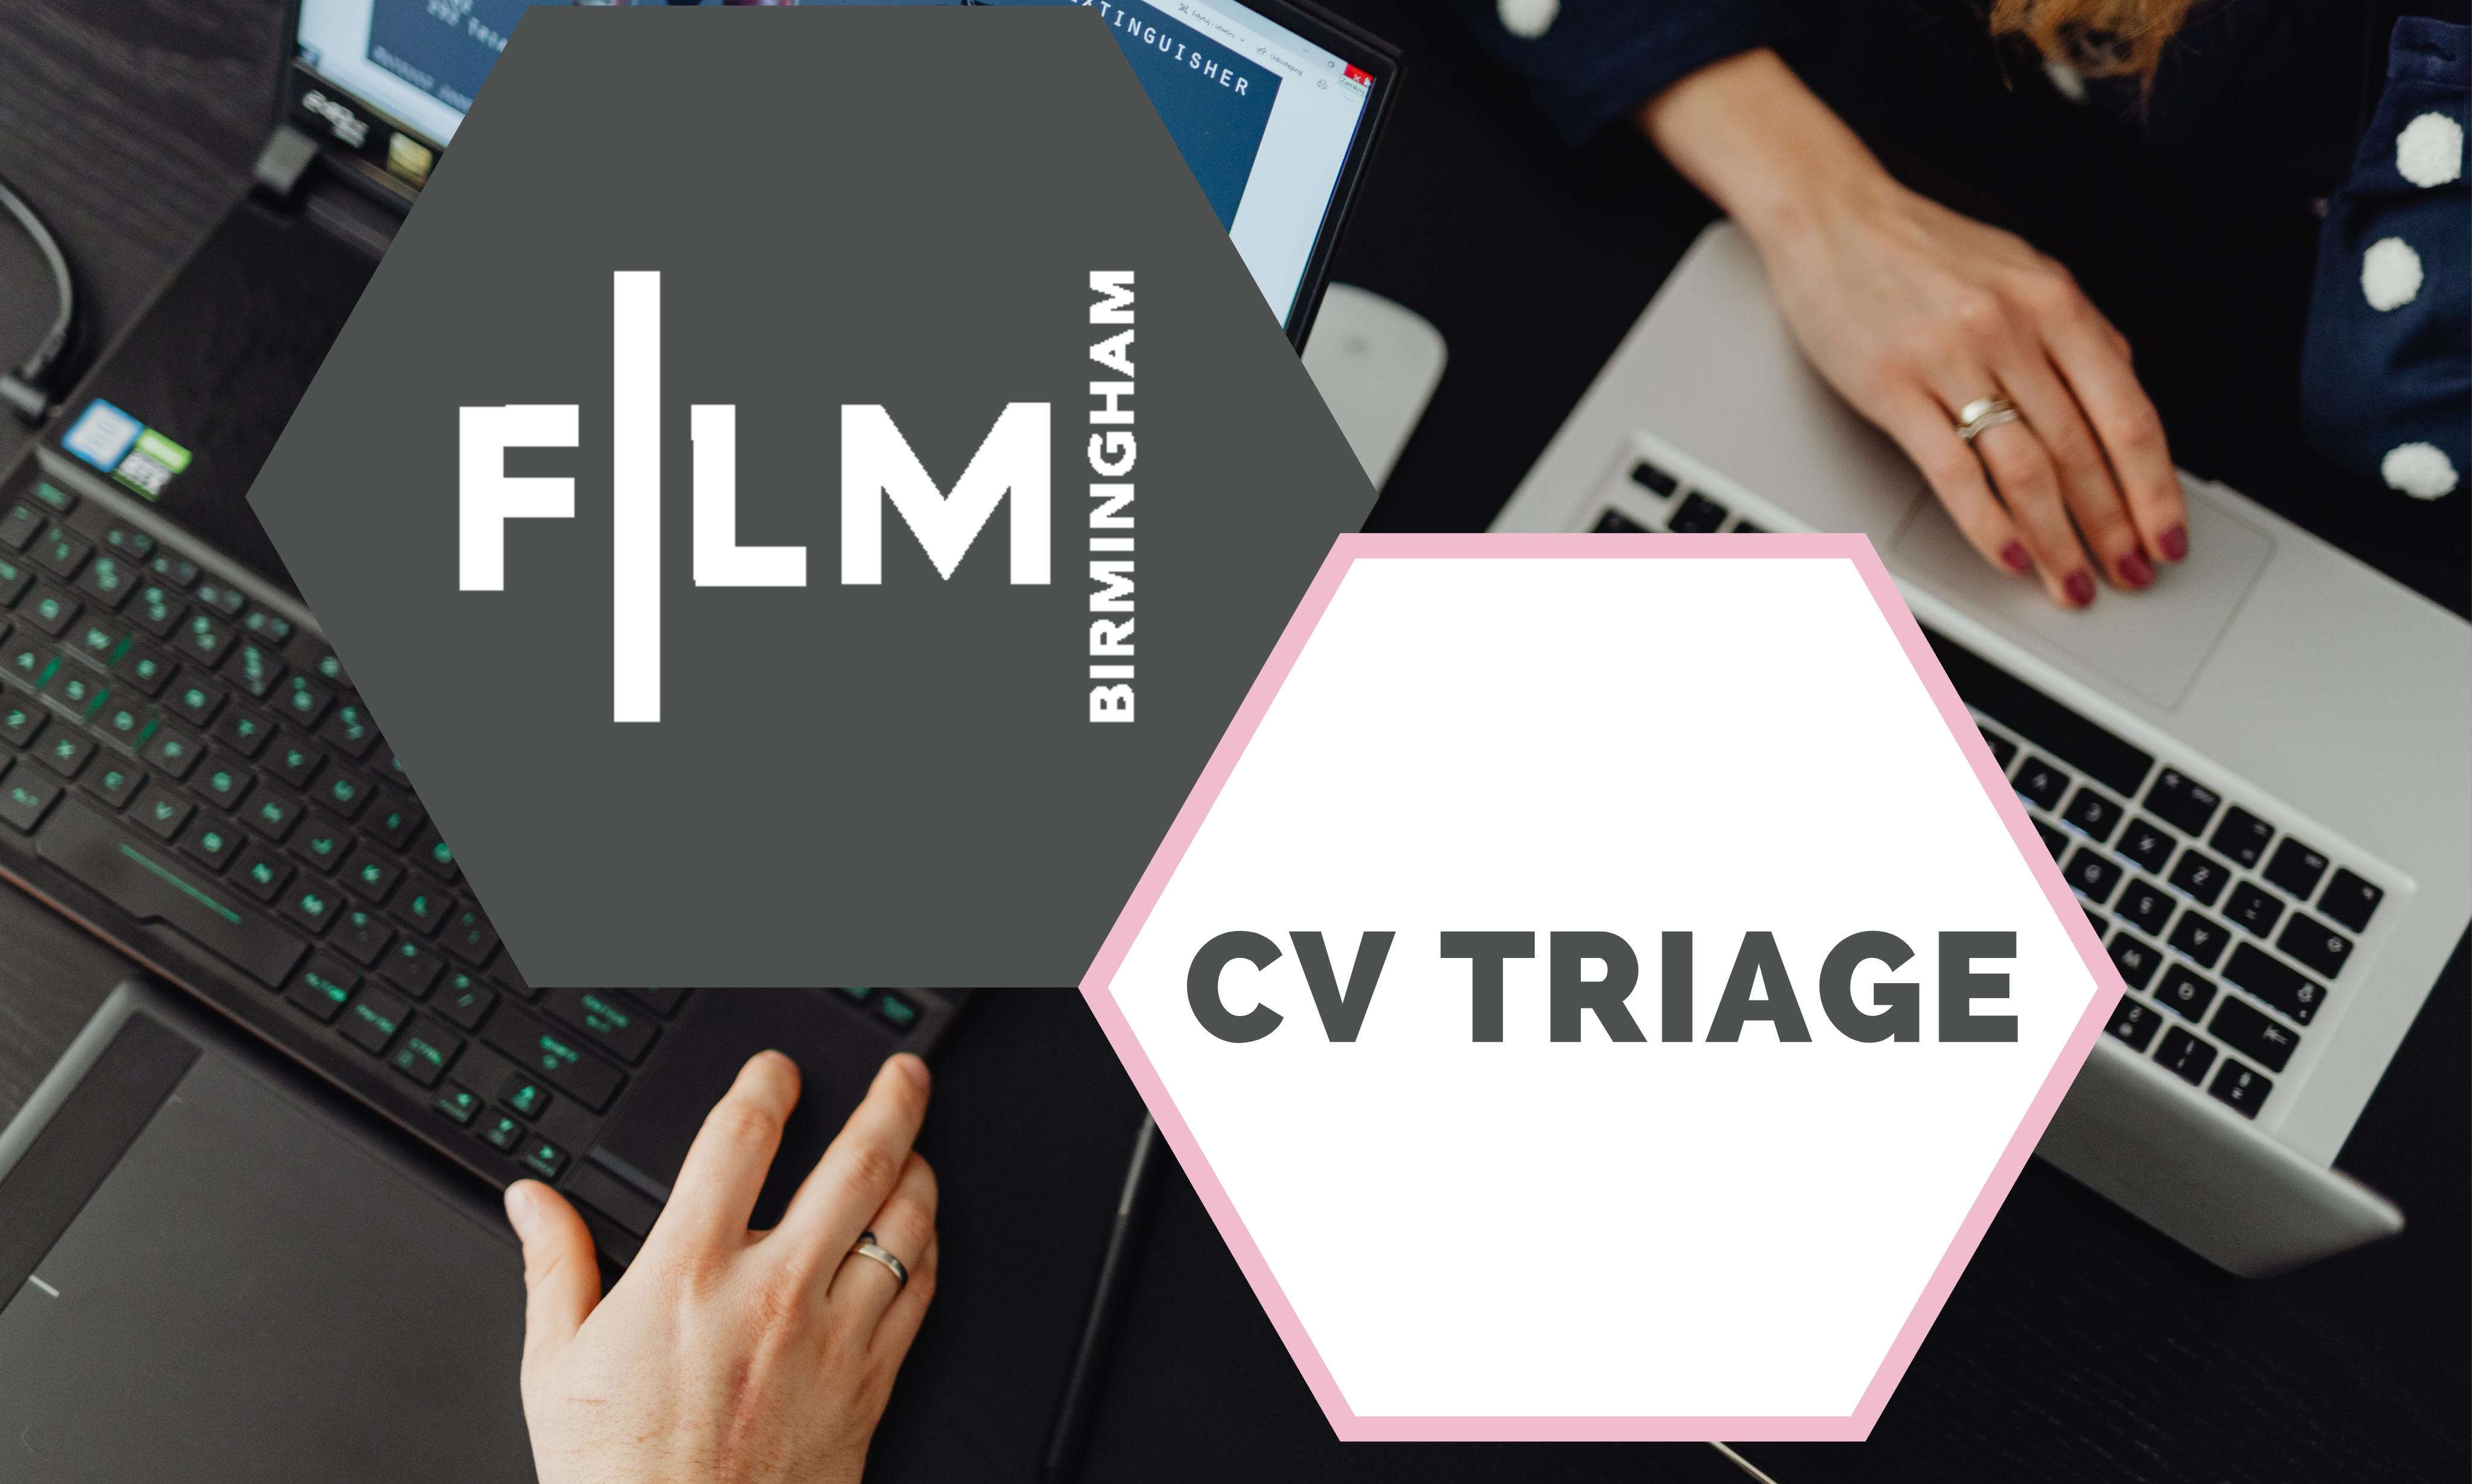 Get Yourself Noticed with Film Birmingham's CV Triage